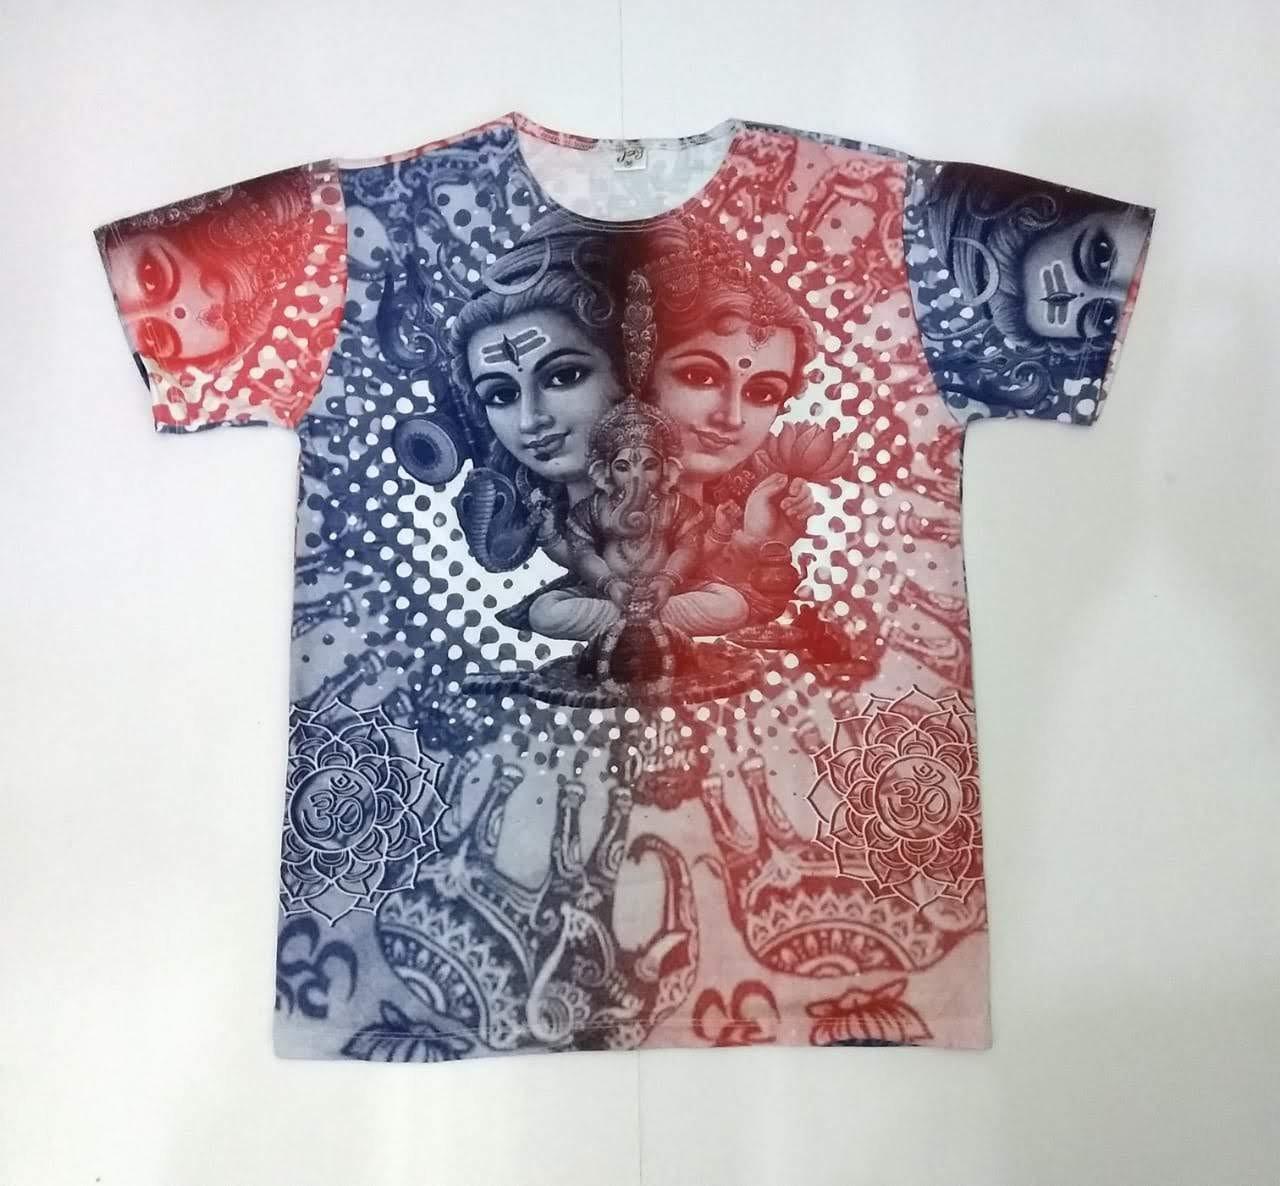 JA037 - Camiseta Branca (Família Ganesh)